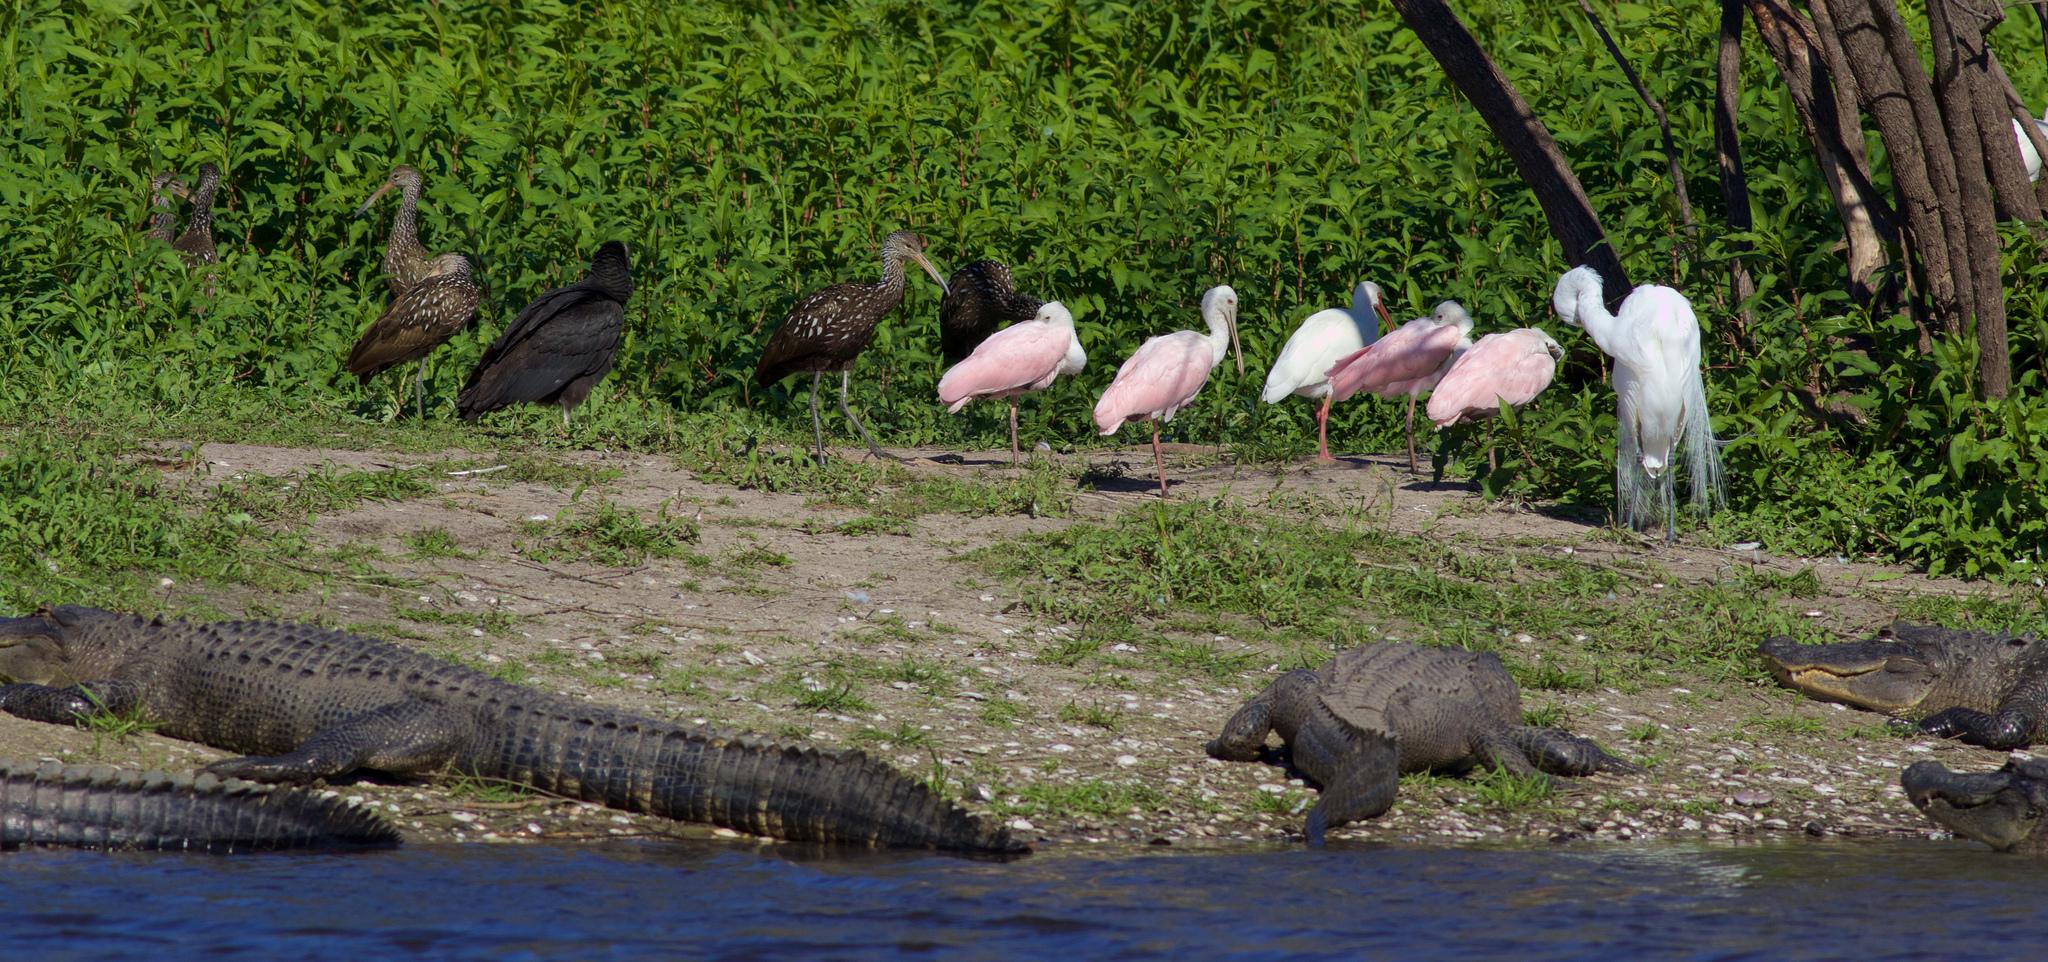 Black Vultures, Limpkins, Roseate Spoonbills, Great Egret, and American Alligators